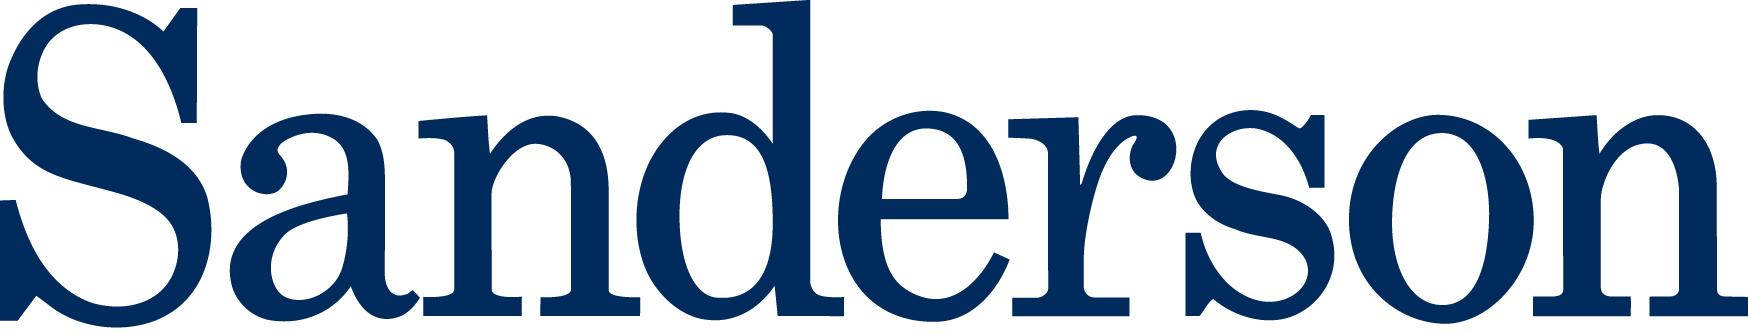 https://dibleandroy.co.uk/wp-content/uploads/2017/08/Sanderson-Logo-word-blue.jpg